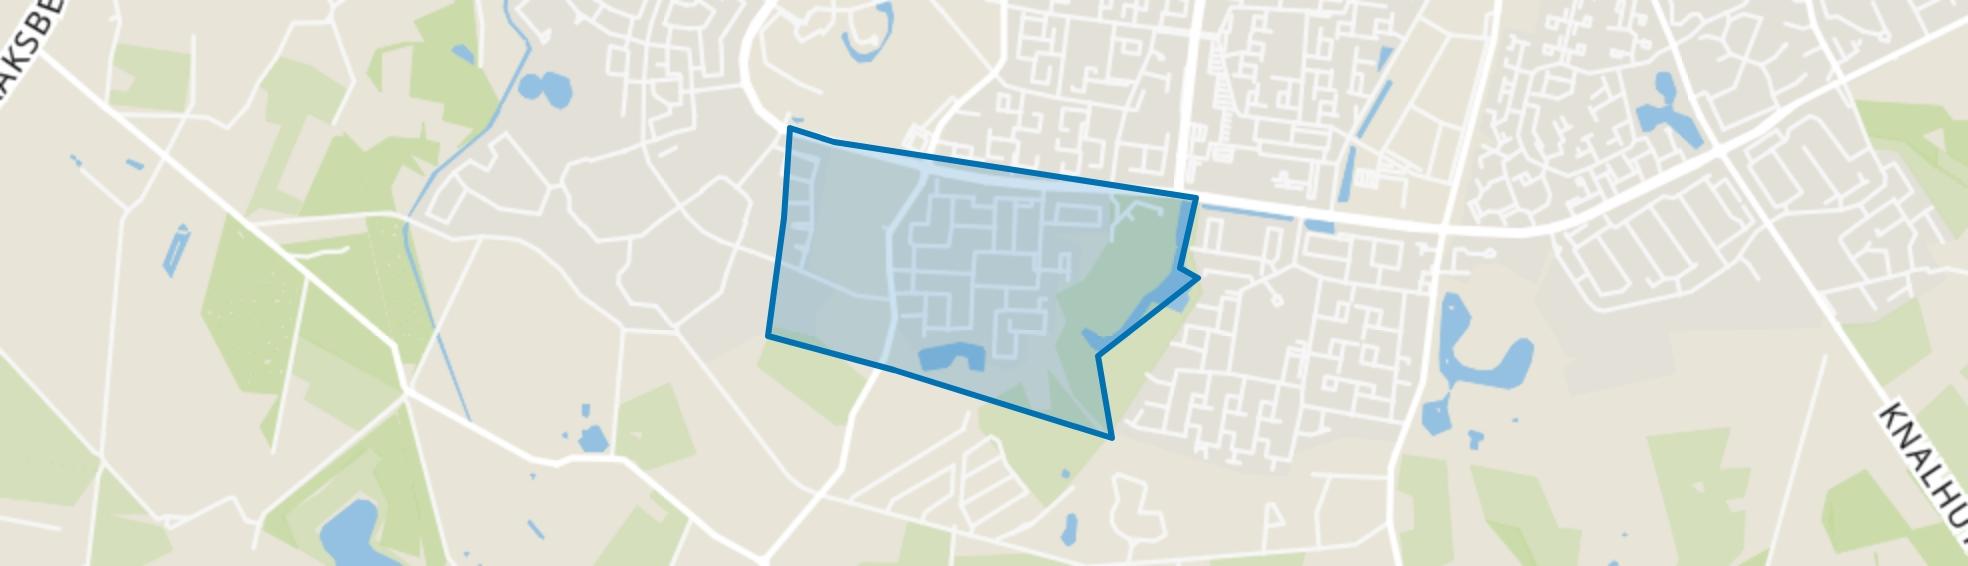 Wesselerbrink Zuid-West, Enschede map